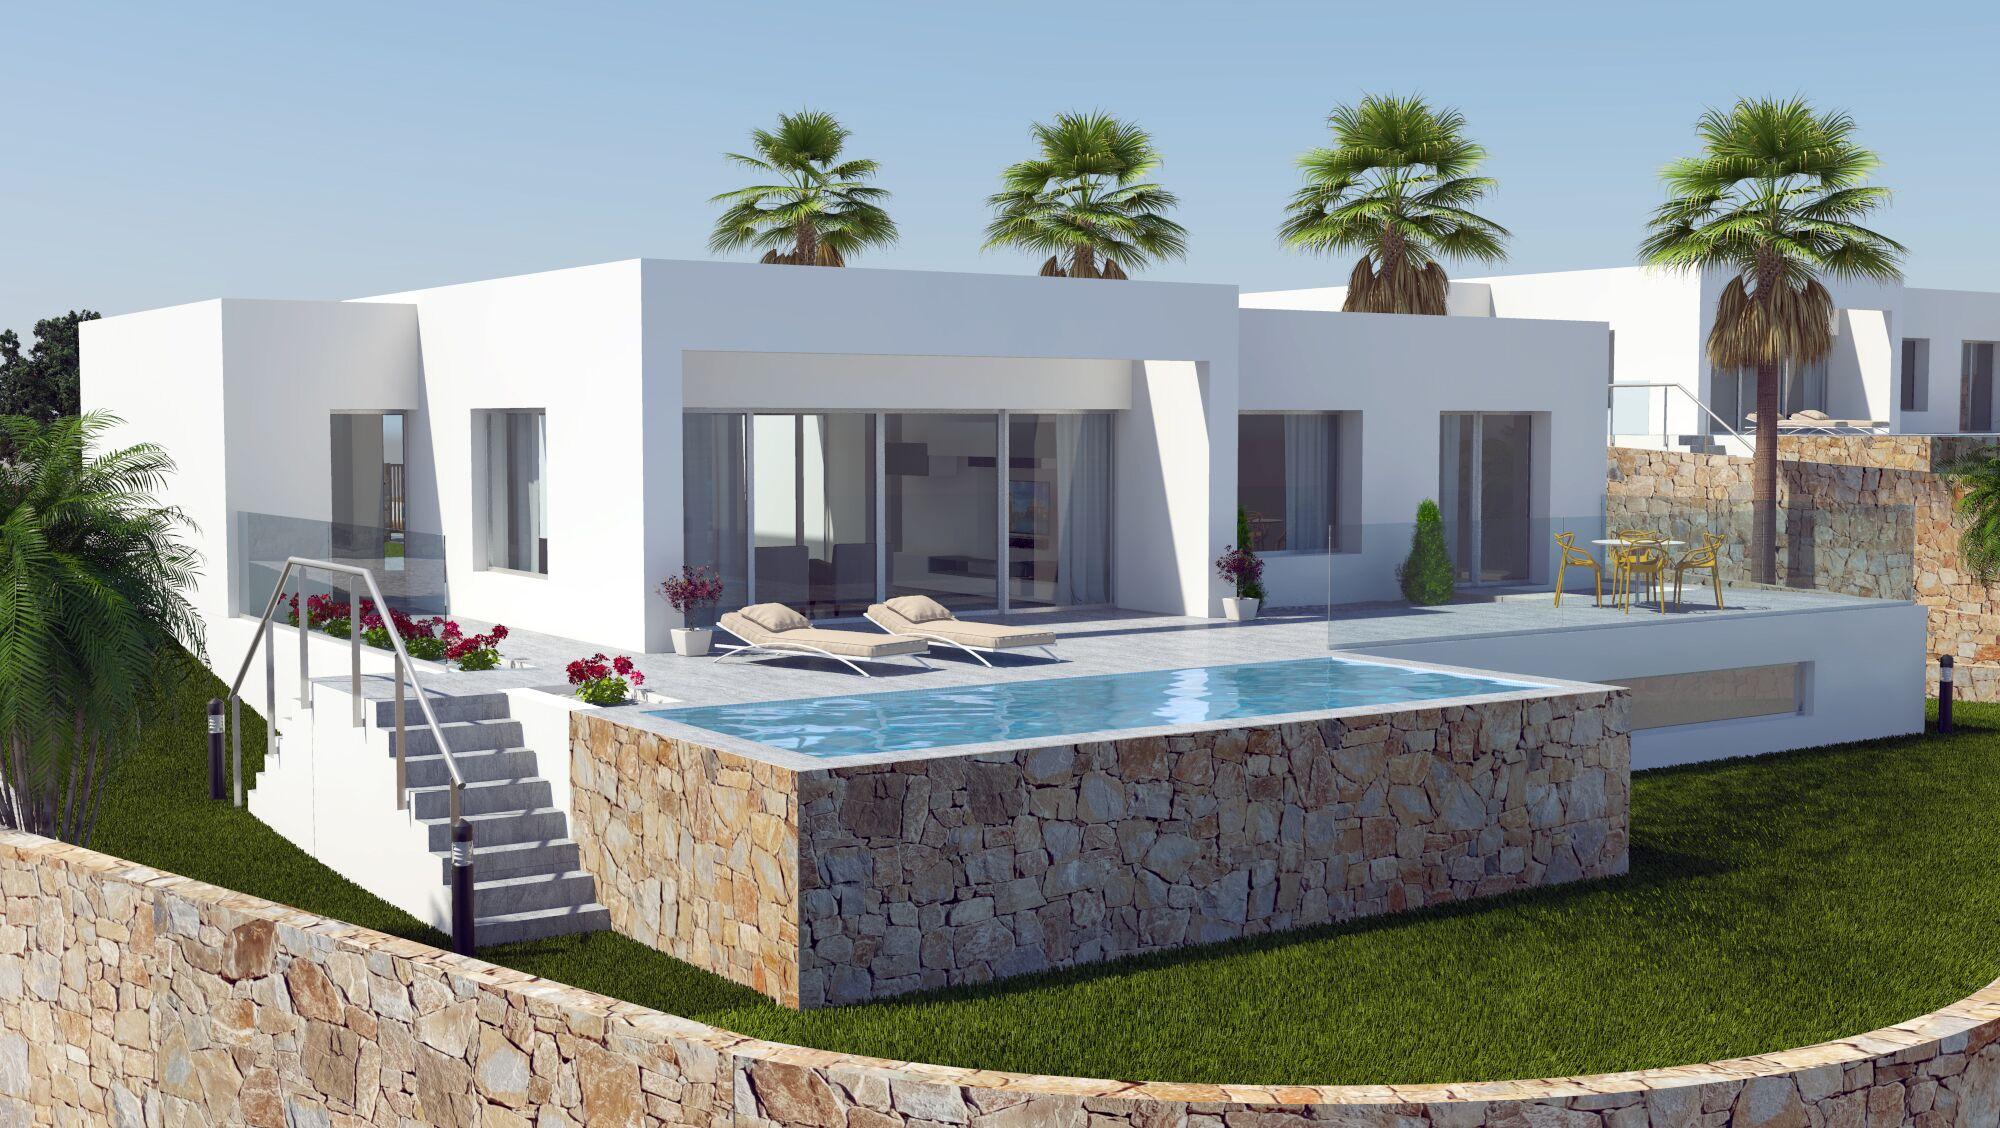 moderne bungalows op 5* golfresort met zeezicht - spanje specials - Moderne Bungalows